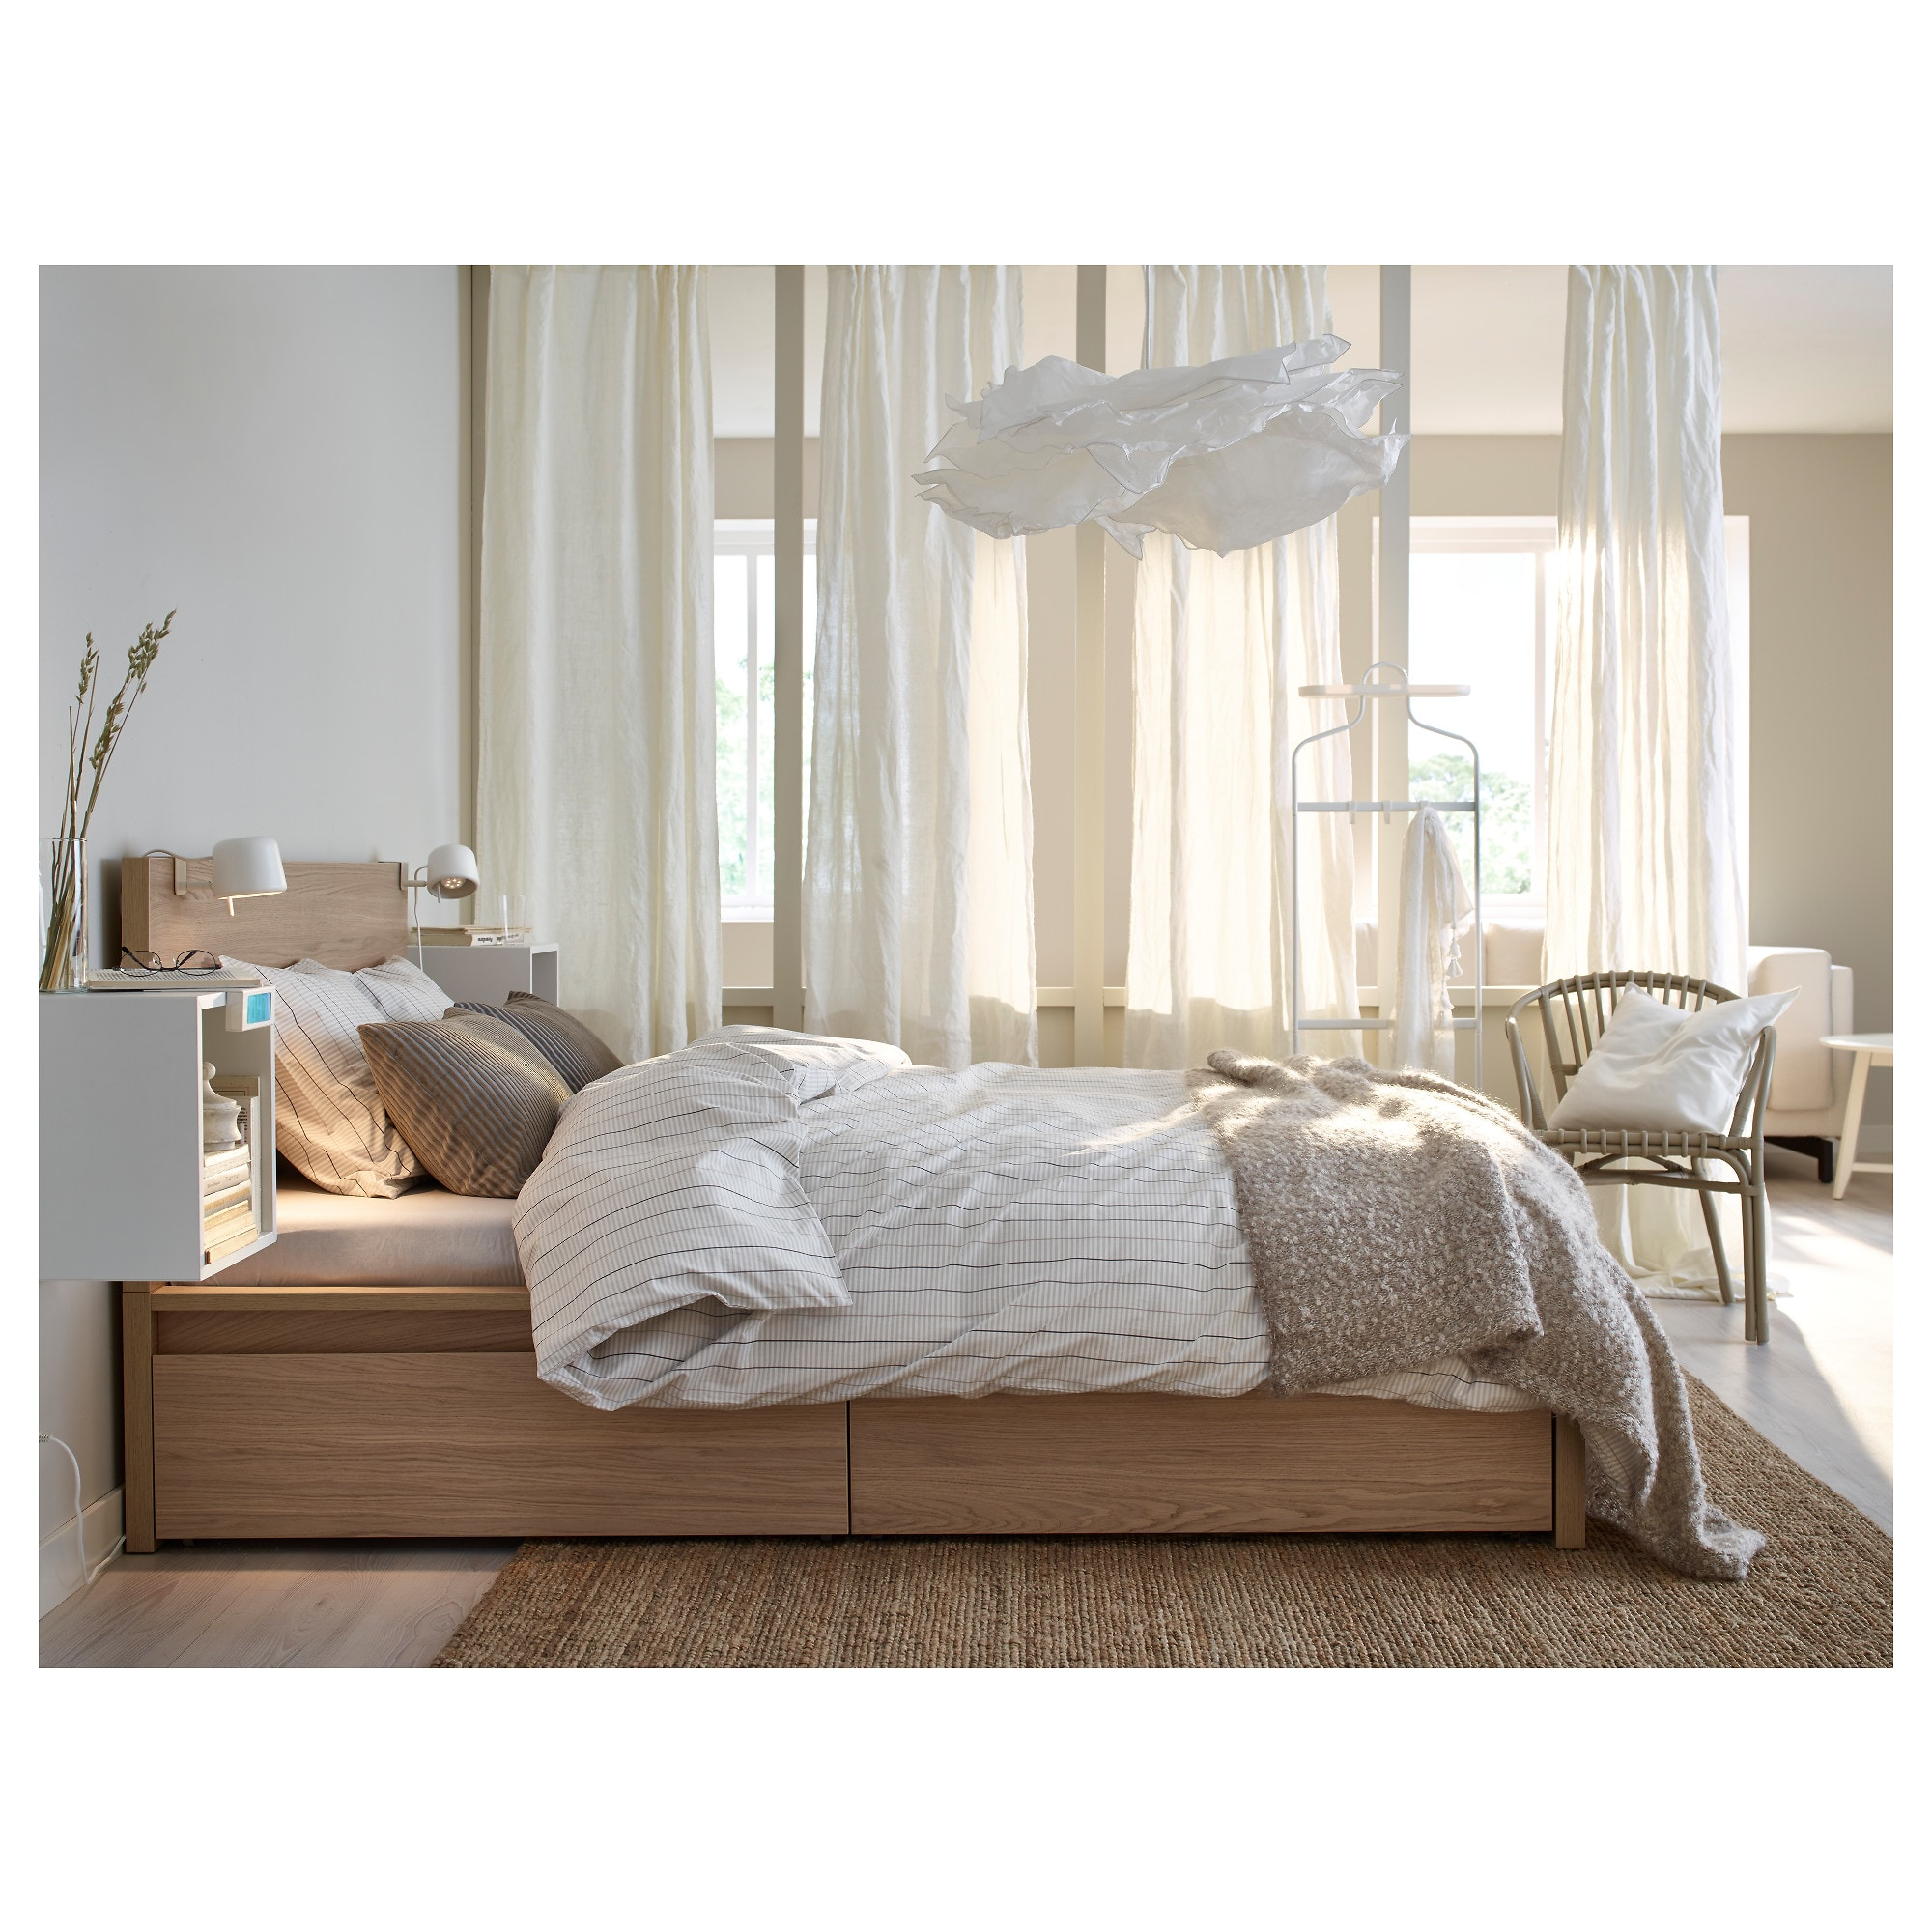 Krusning Pendant Lamp Shade White 33 Ikea Pendant Lamp Shade Oak Bedroom Furniture Ikea Malm Bed